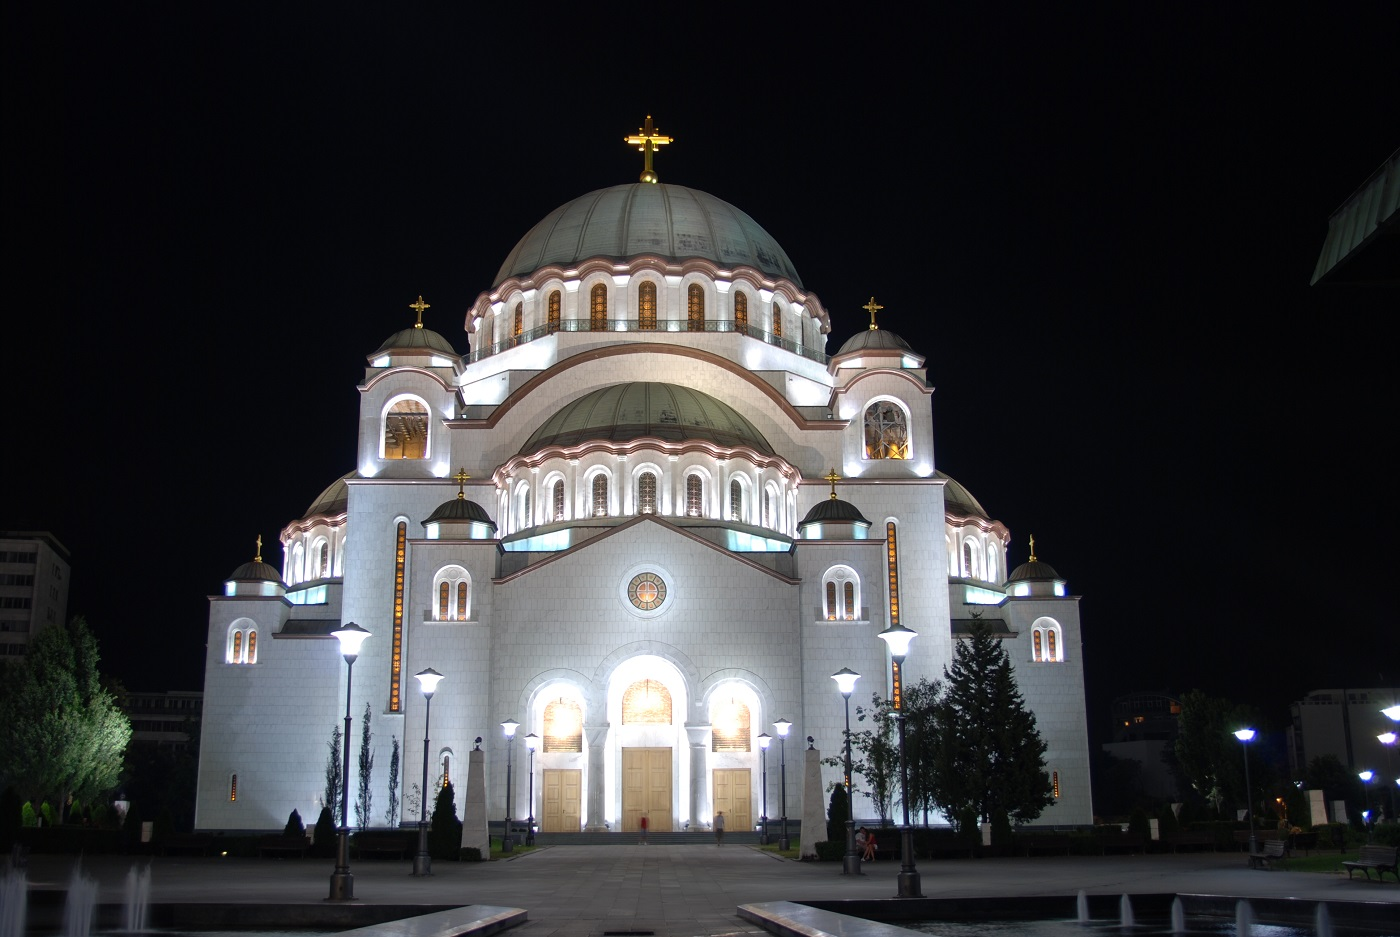 Catedrala Sfântul Sava, Belgrad